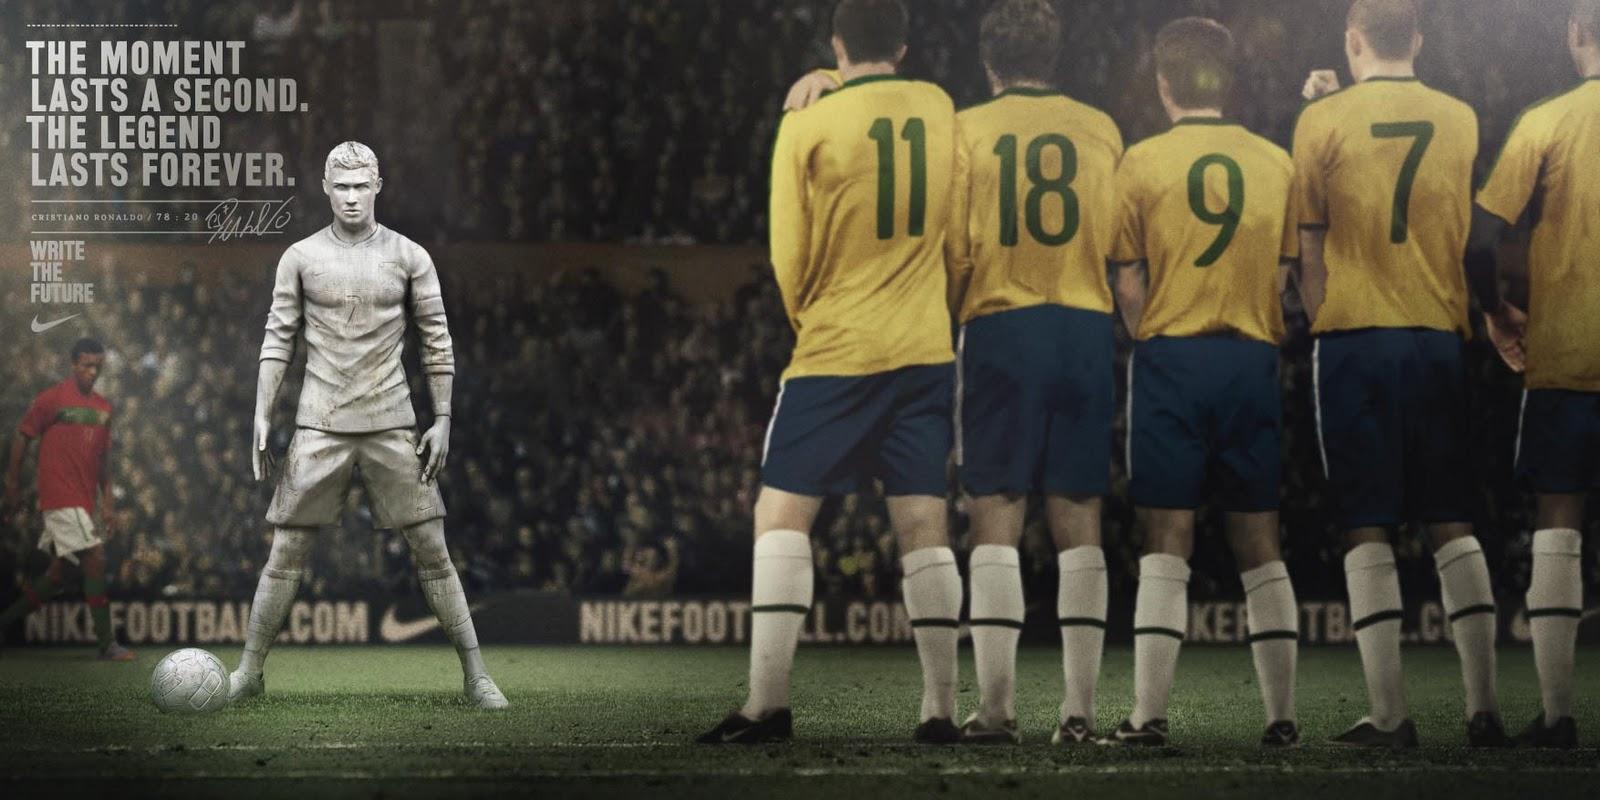 http://1.bp.blogspot.com/_7yECxOsl1KM/TBzNgtcaFjI/AAAAAAAAXk0/JO0KMJc9B9c/s1600/3_Ronaldo.jpg